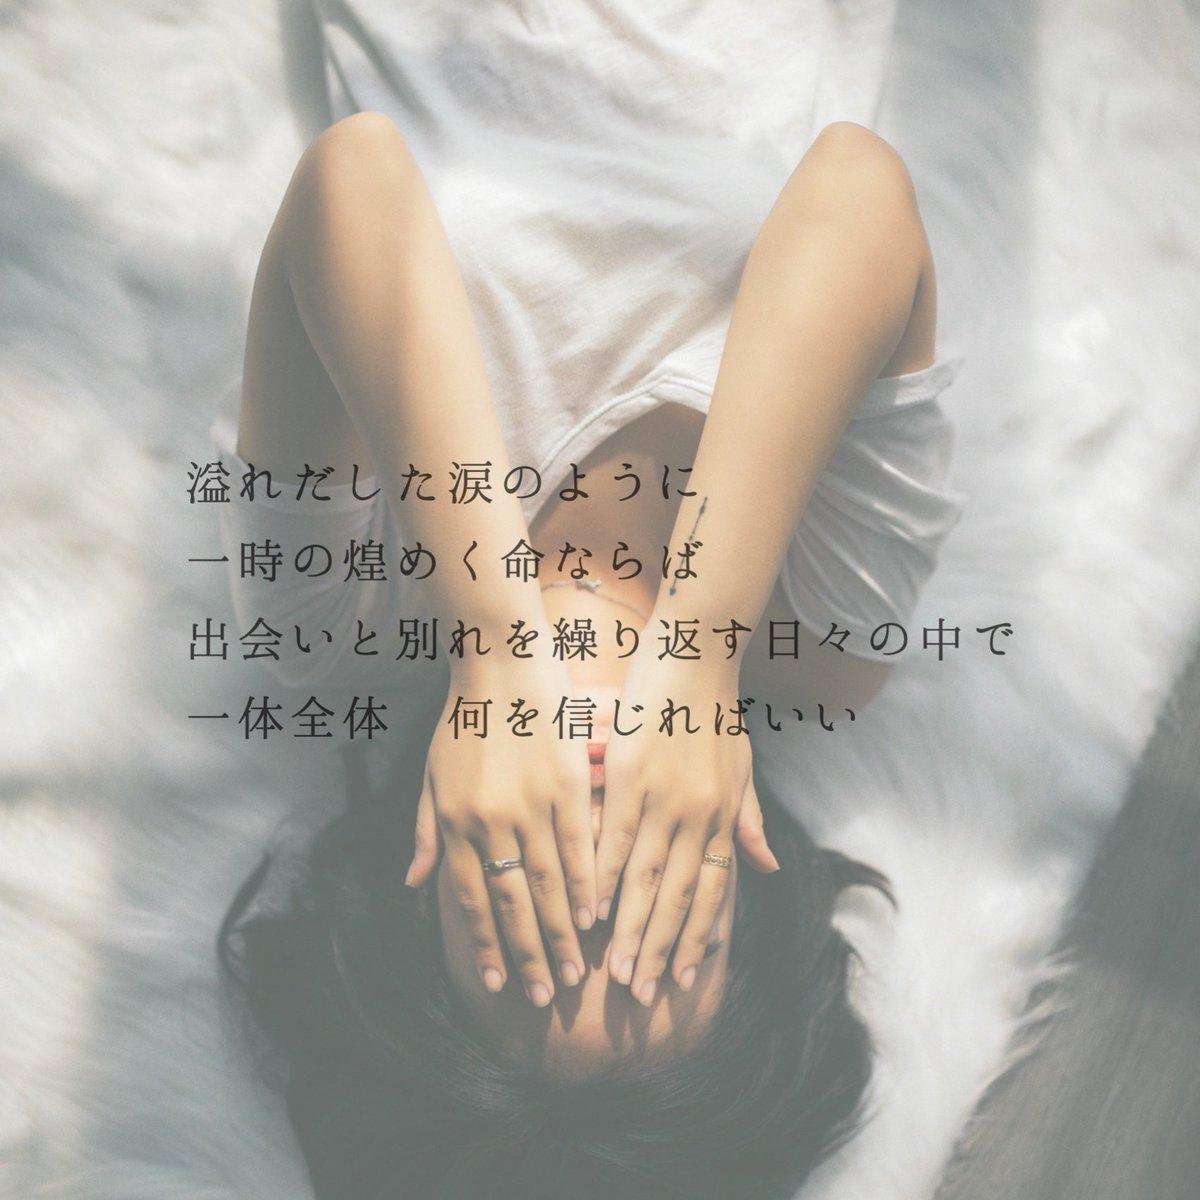 「PrayerX」King Gnu   https://www. instagram.com/p/B1-83H6ACMe/ ?igshid=9ayfb34g9id  … <br>http://pic.twitter.com/DiLHnU0O45